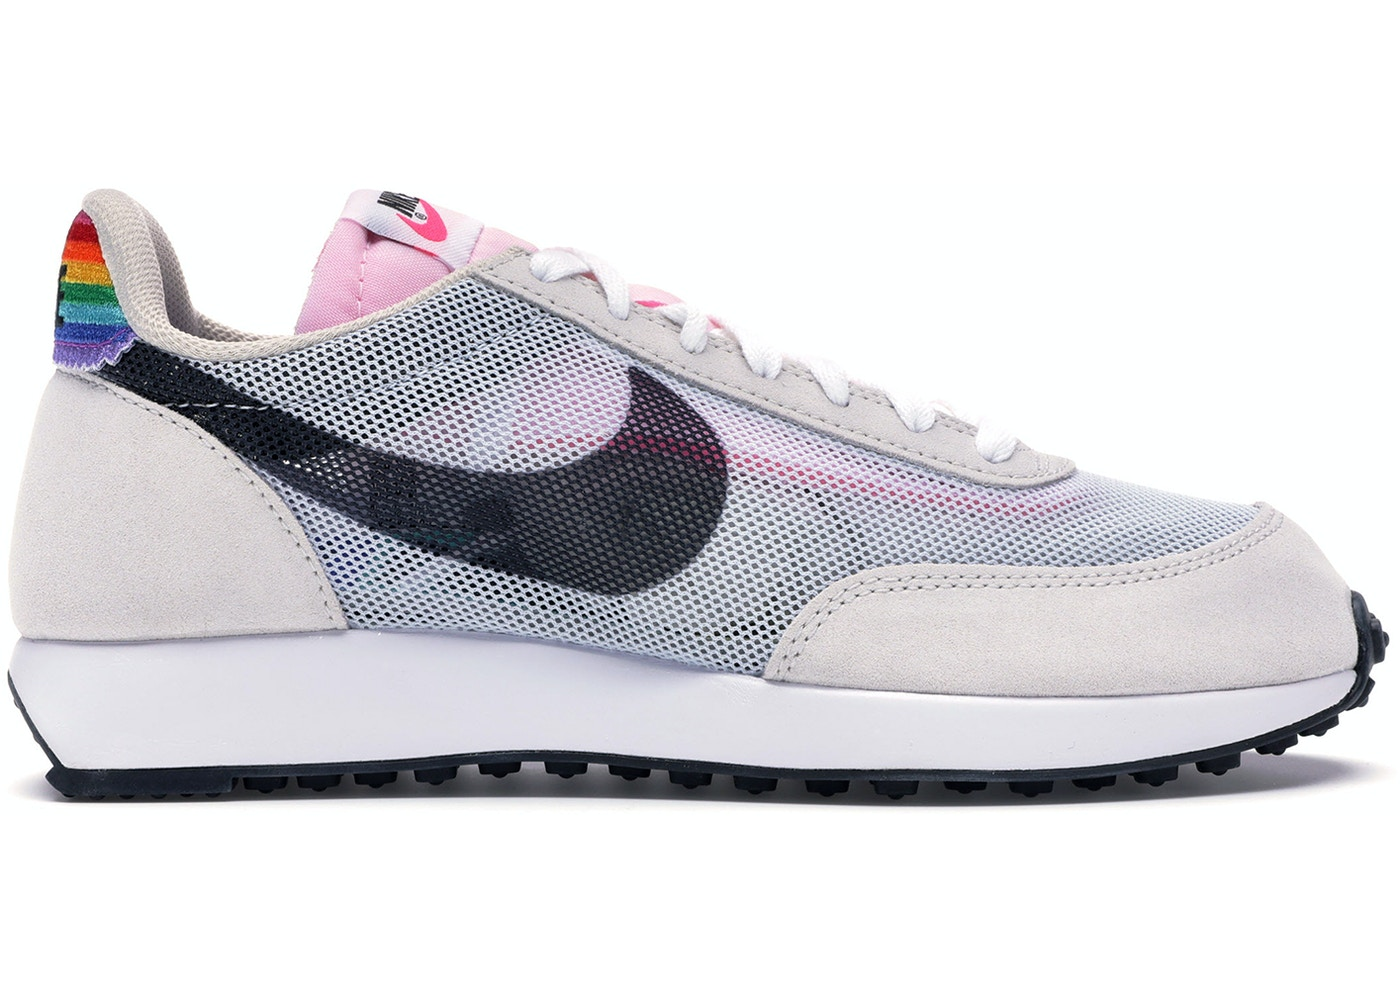 size 40 644c4 cad09 Nike Tailwind 79 Be True (2019)